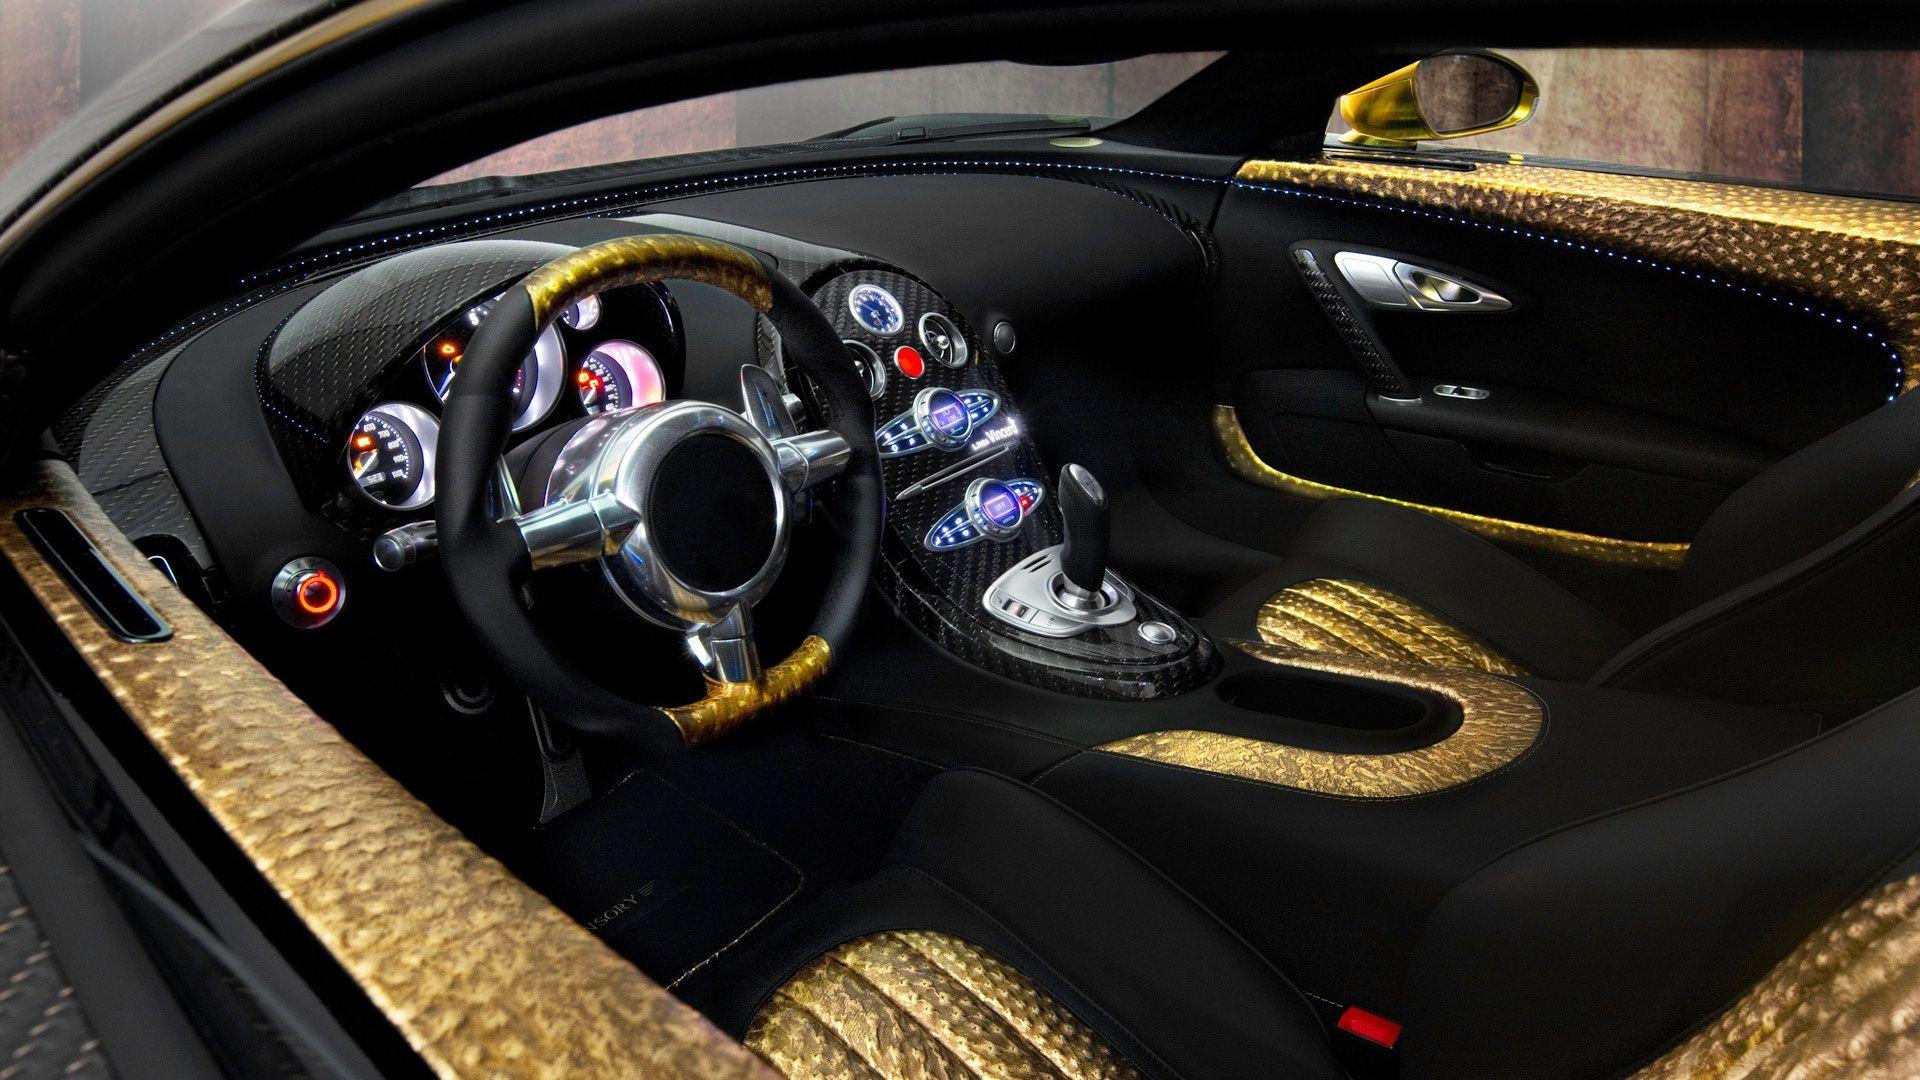 Bugatti Veyron Interior Free Hd Wallpapers From Www Hotszots Eu Bugatti Veyron Luxury Car Interior Bugatti Veyron Interior